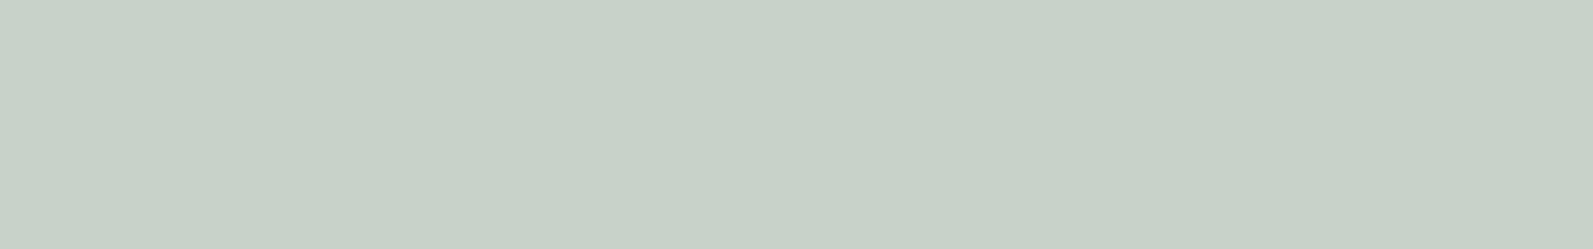 Green Instagram Background .jpg